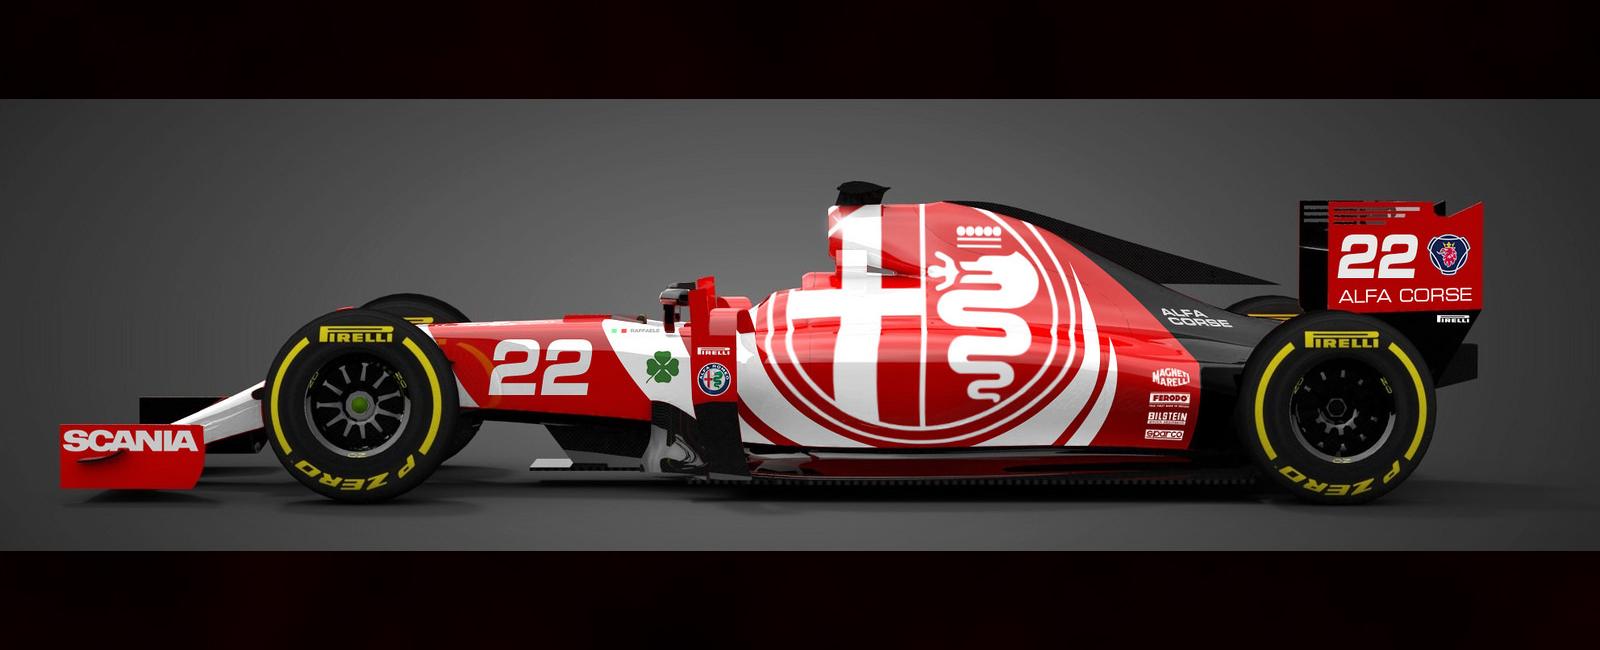 alfa-romeo-f1-car-photos-concept-design